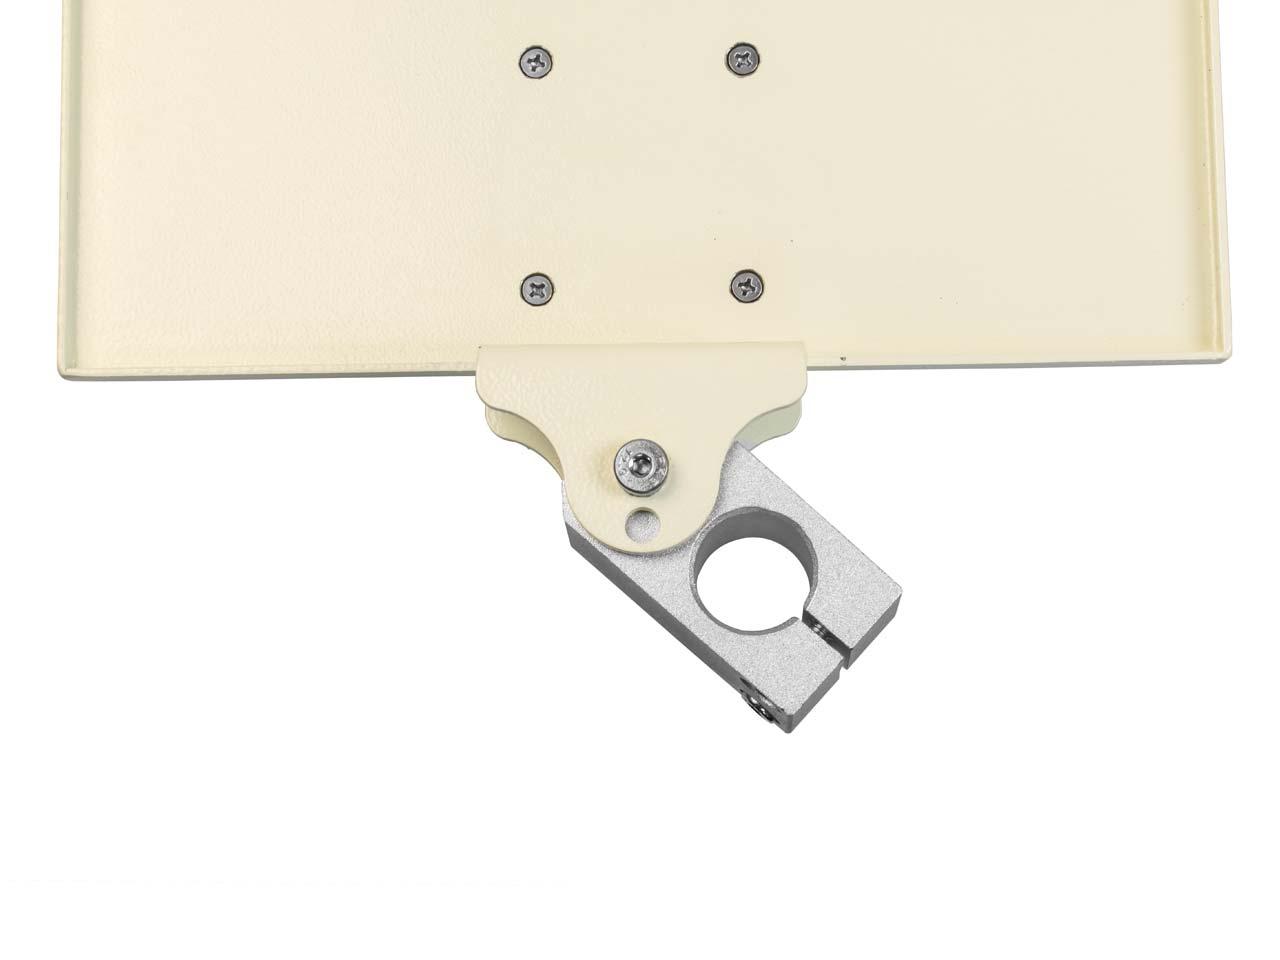 Genuine-US-Foredom-Workbench-Accessories-System miniatura 42